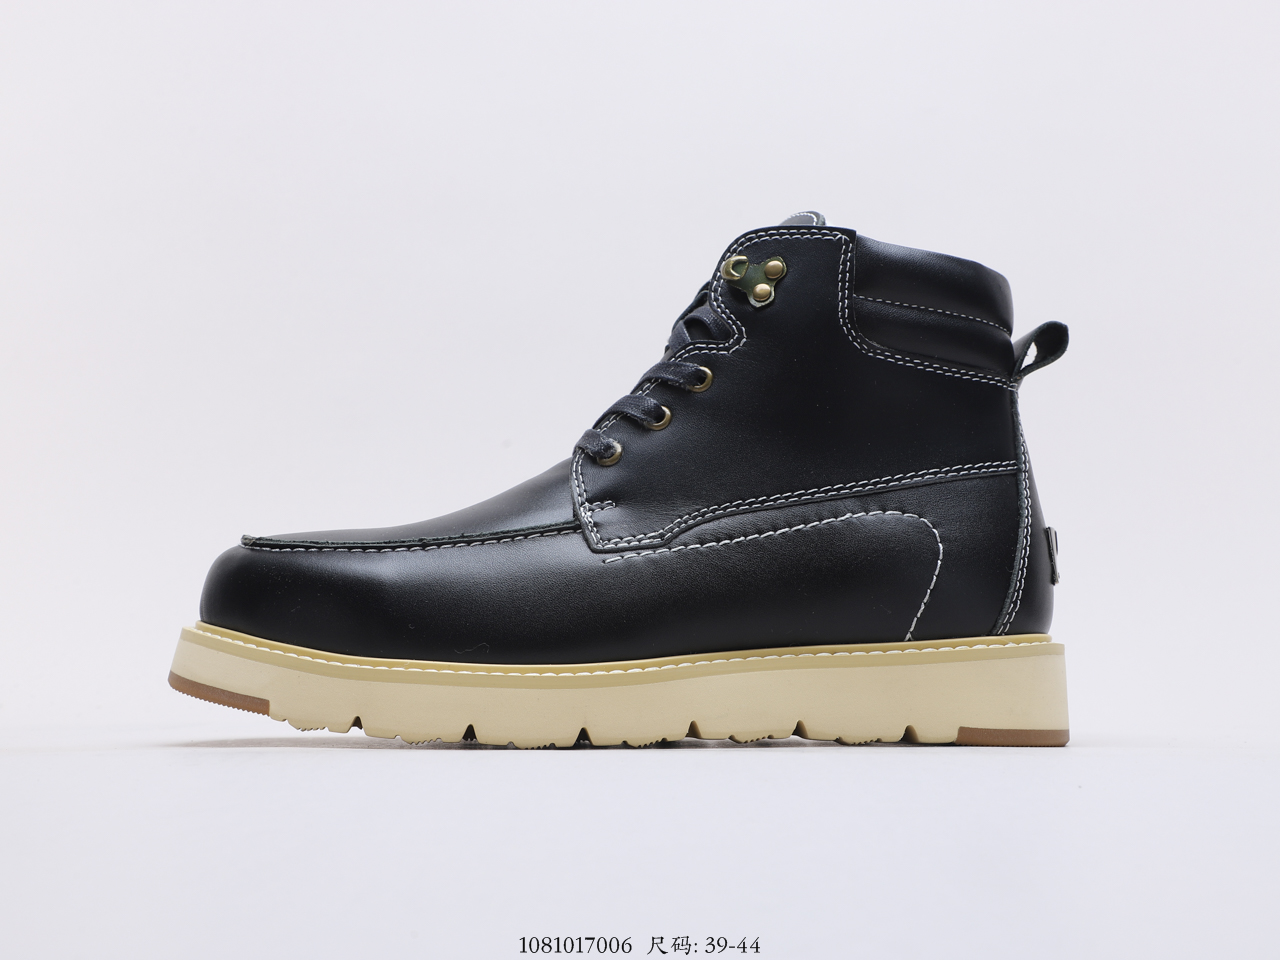 UGG Man's 2020冬季新品海报款马丁靴 正品代工厂订单